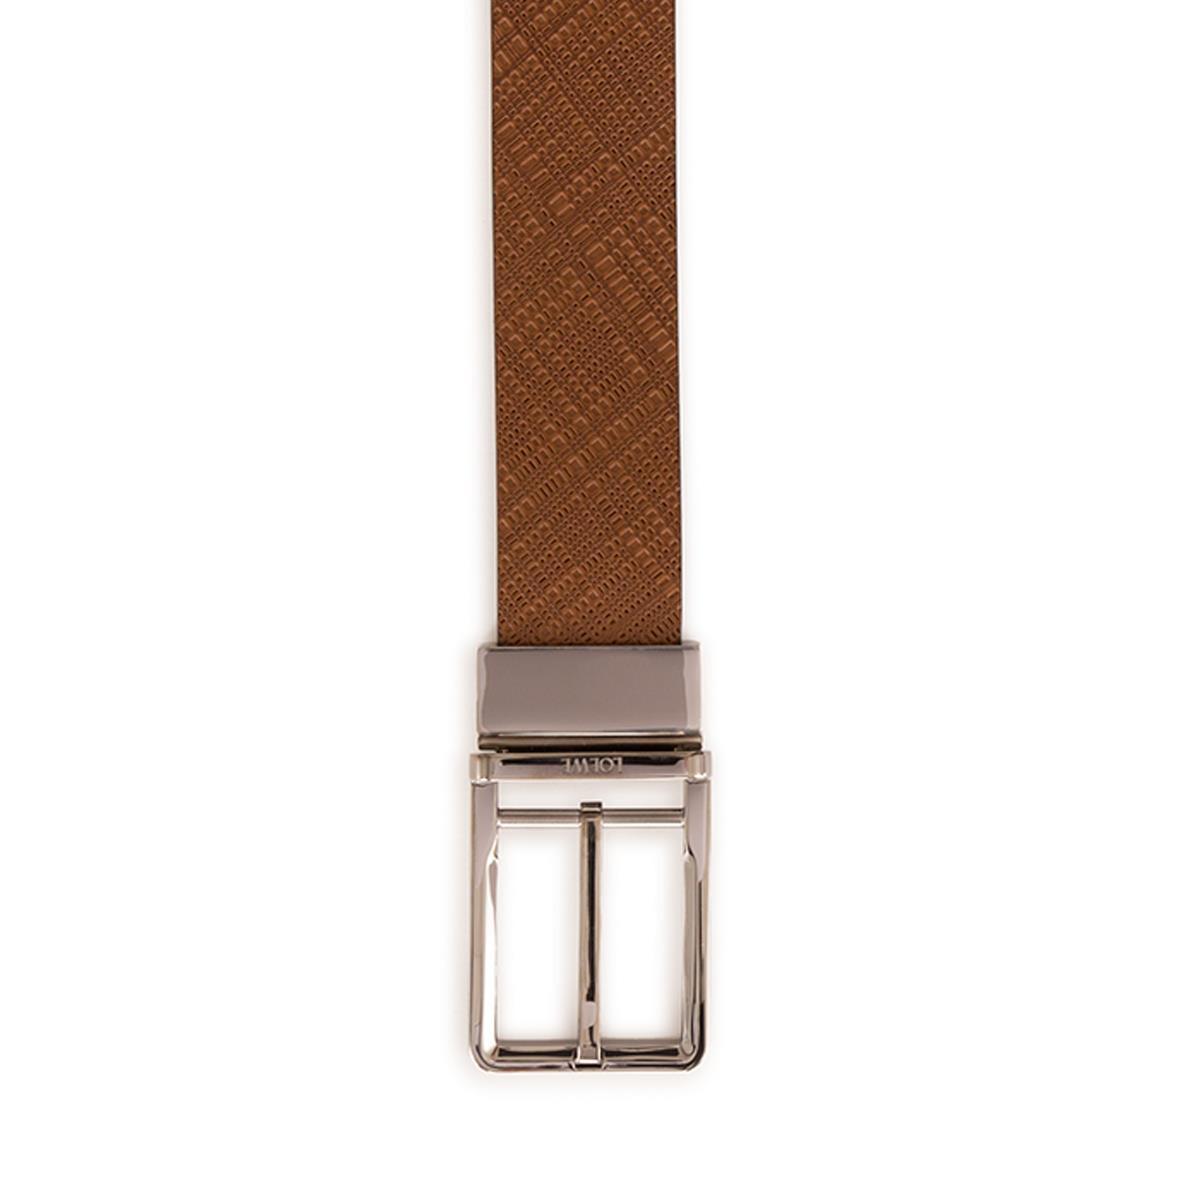 LOEWE Cinturon  Formal 3.2Cm Adj/Rev Marron Oscuro/Negro/Rutenio front